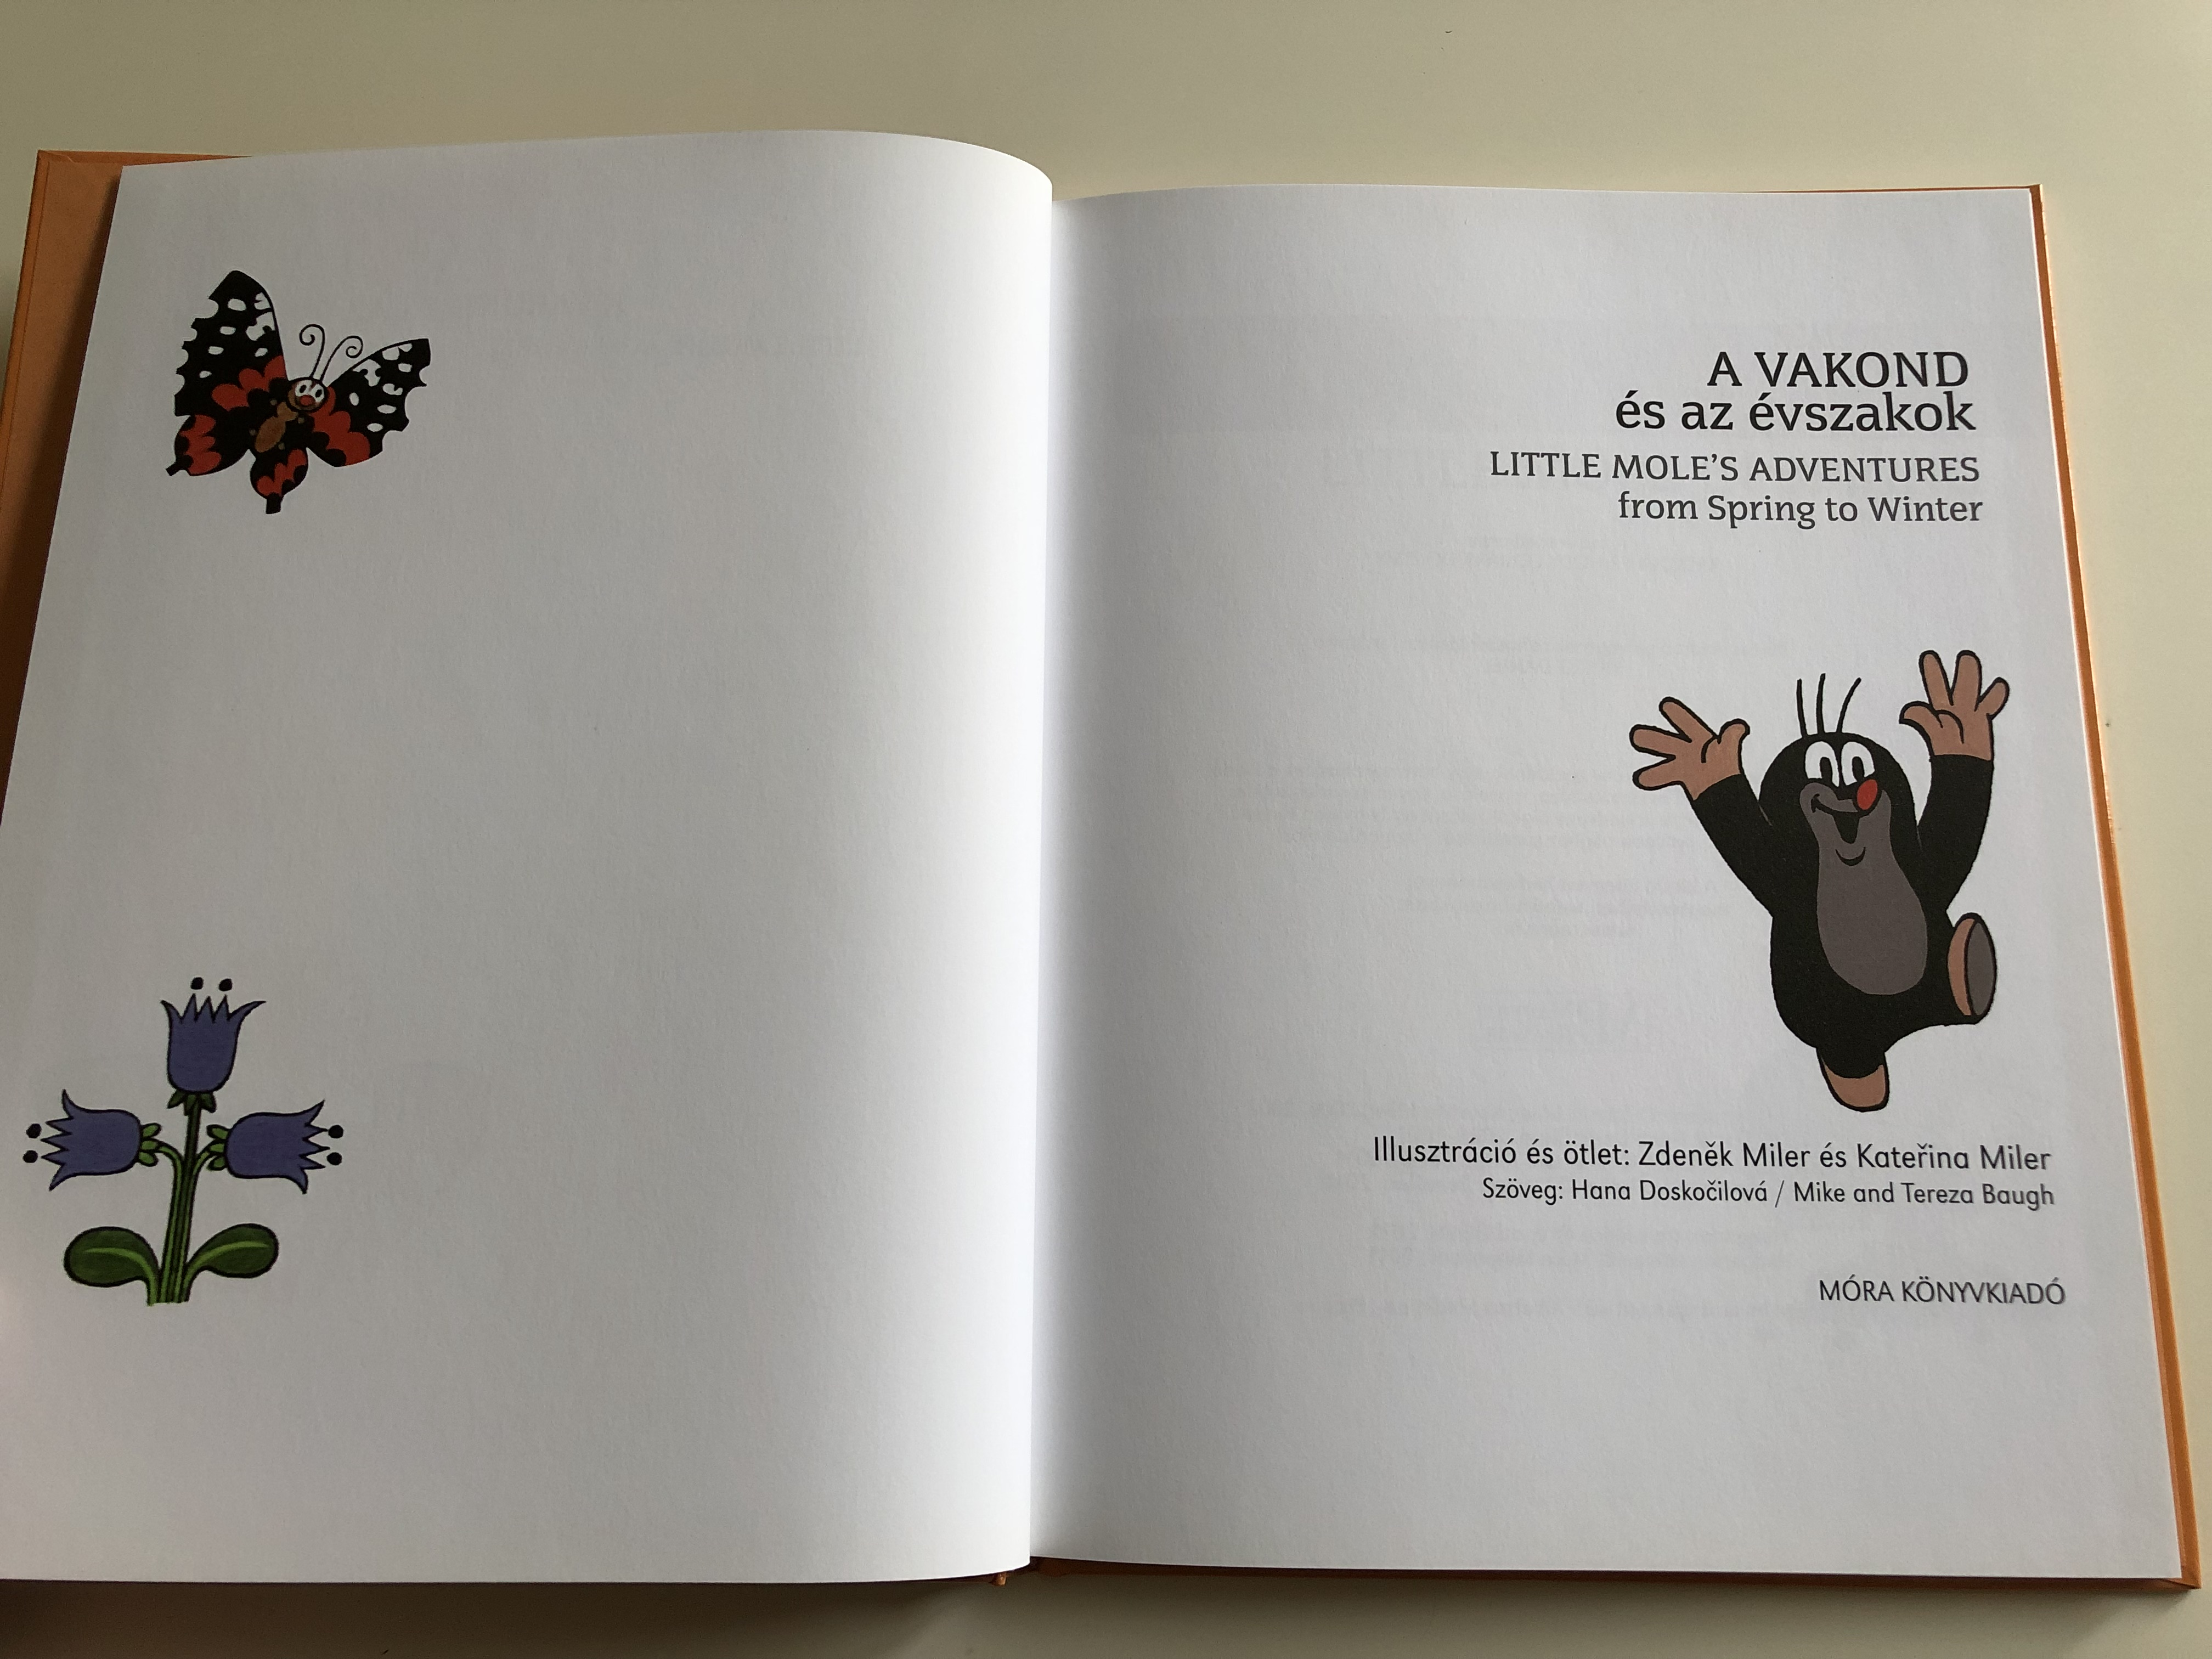 krtek-bilingual-english-hungarian-book-little-mole-s-adventure-from-spring-to-winter-3-.jpg